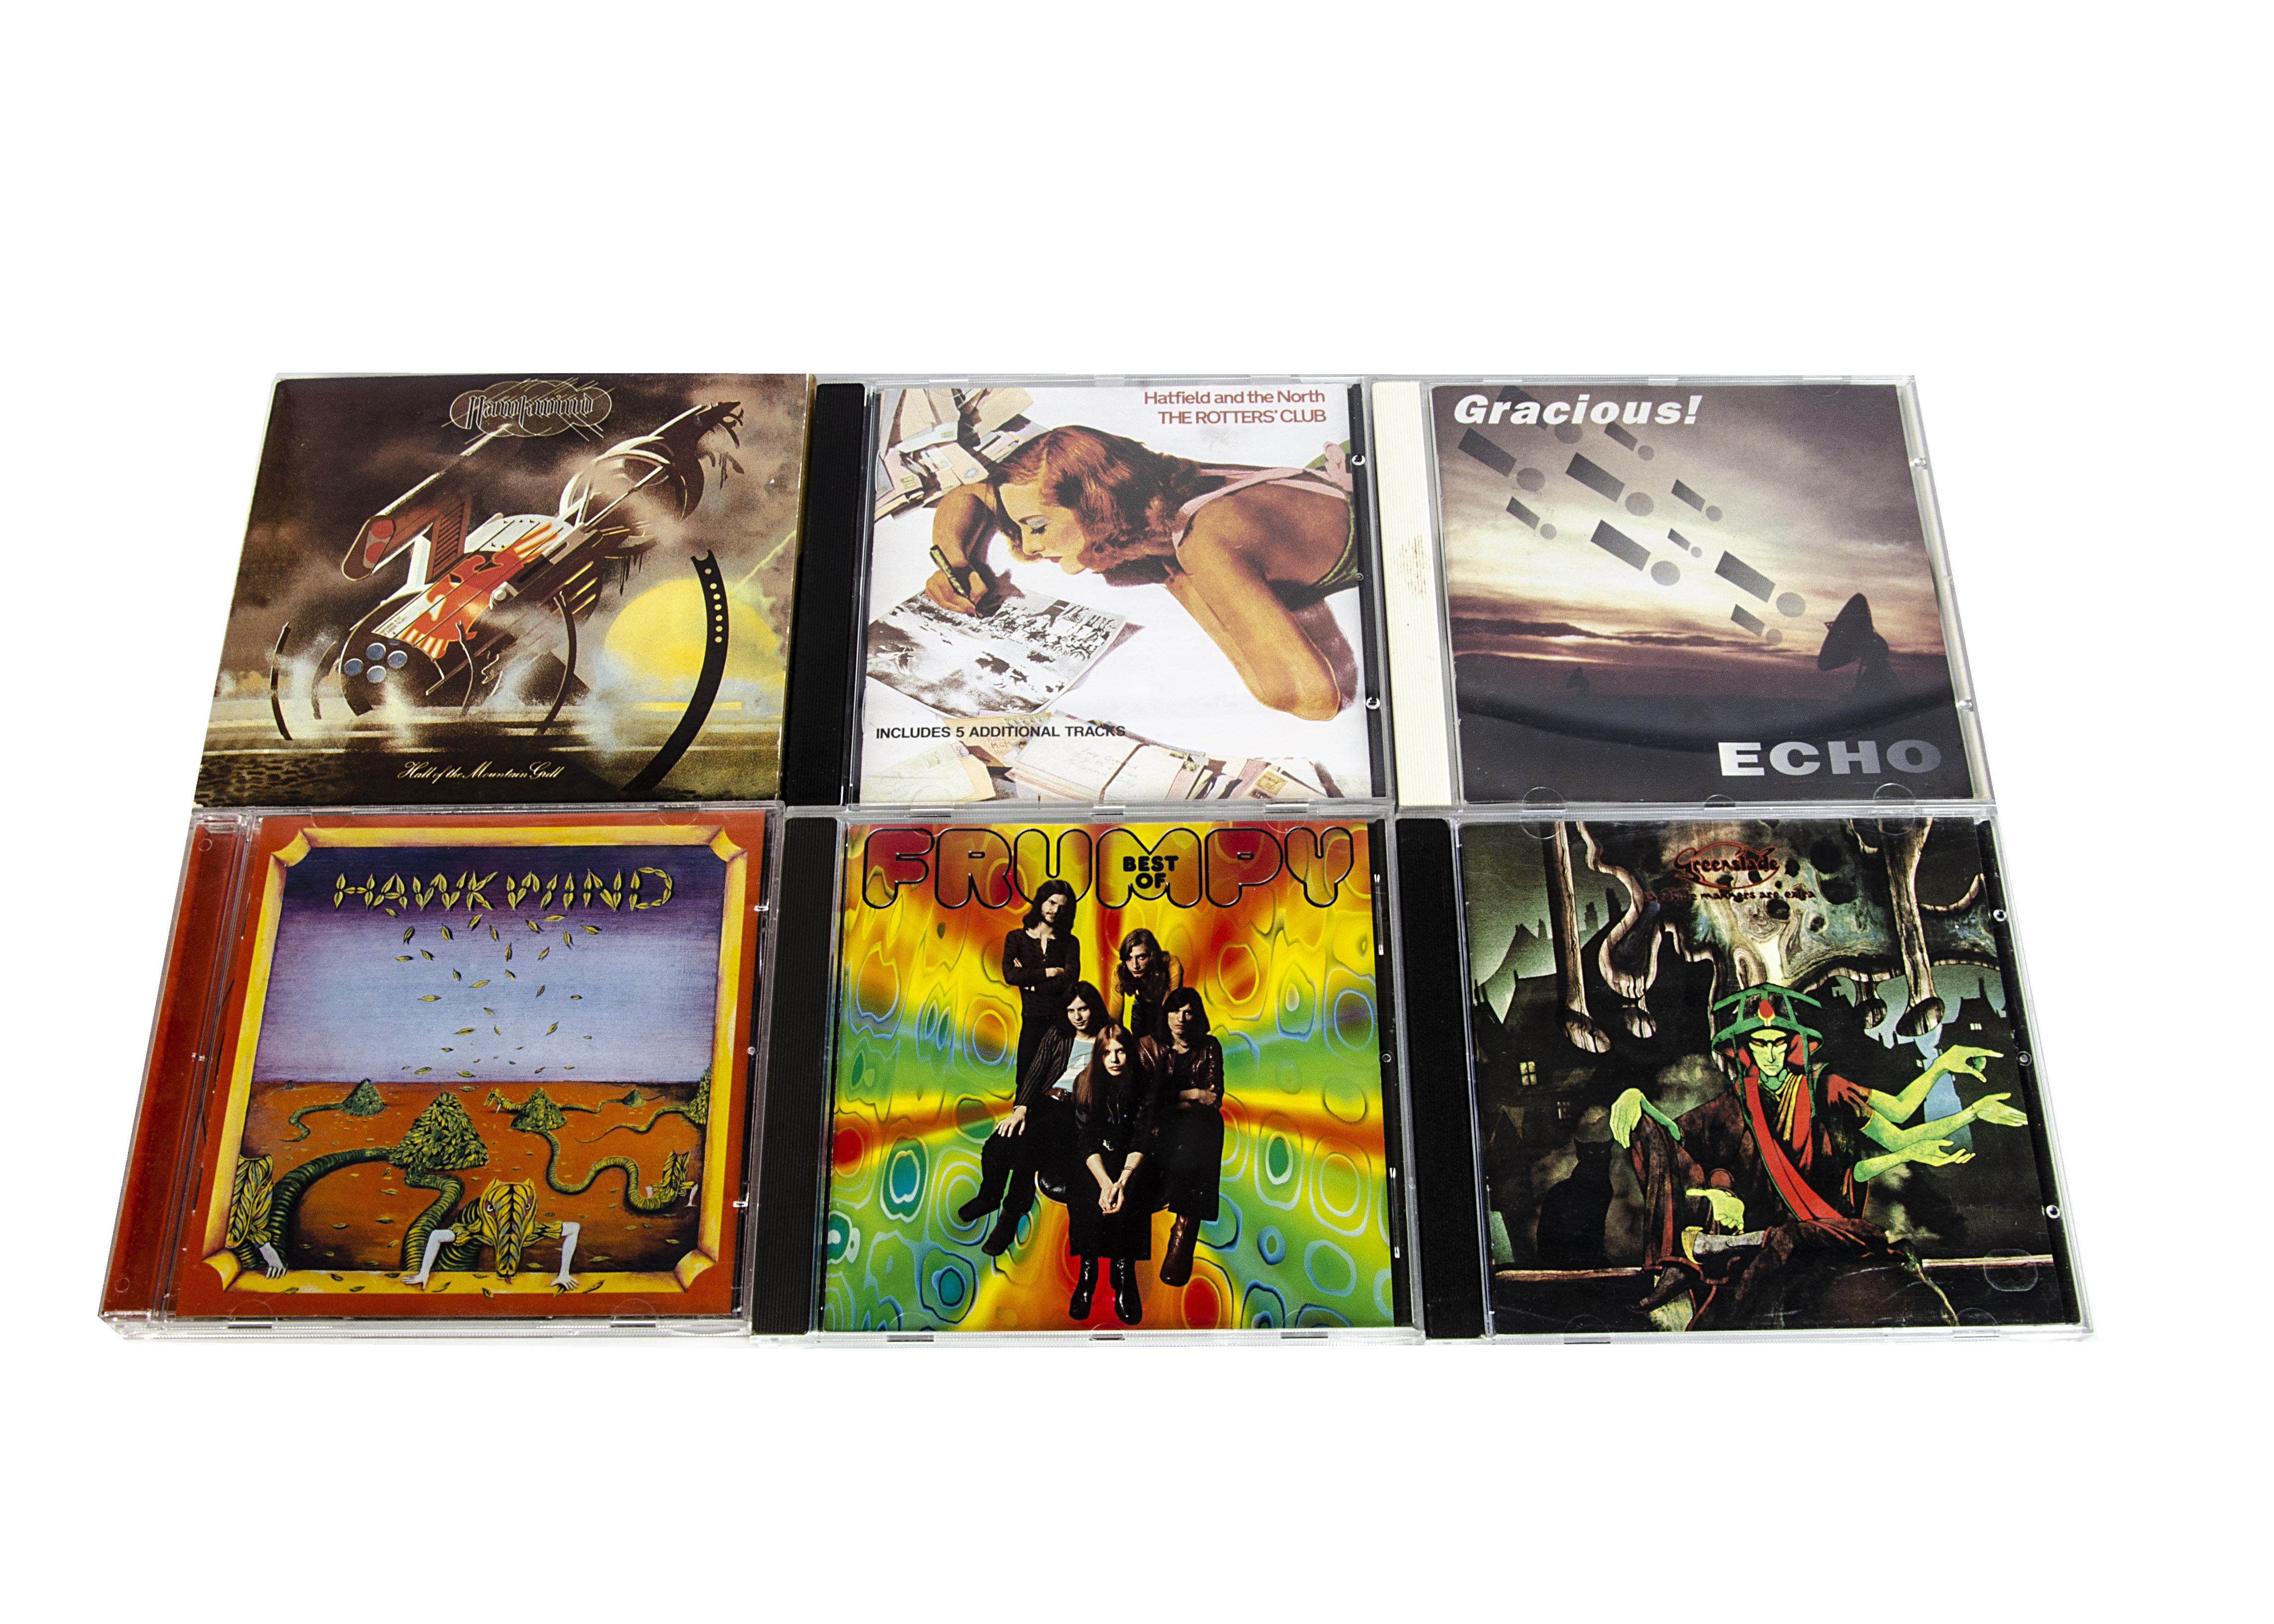 Prog Rock CDs, twenty-seven CDs of mainly Progressive Rock with artists comprising Caravan (